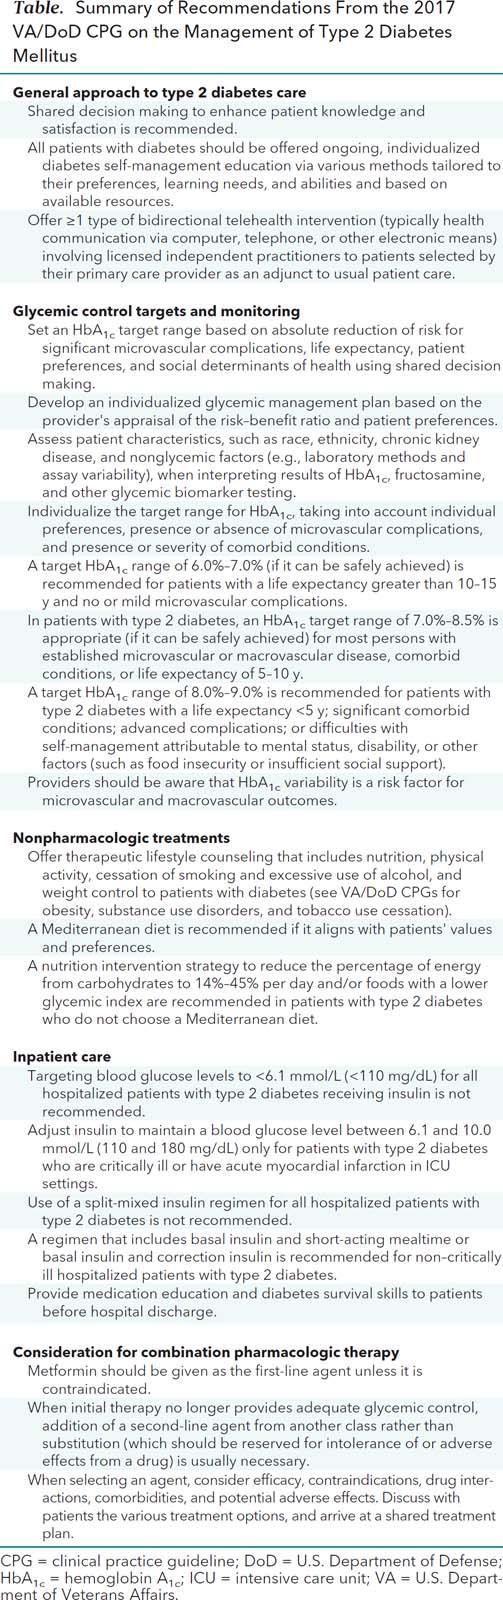 Type 2 Diabetes Statistics 2017